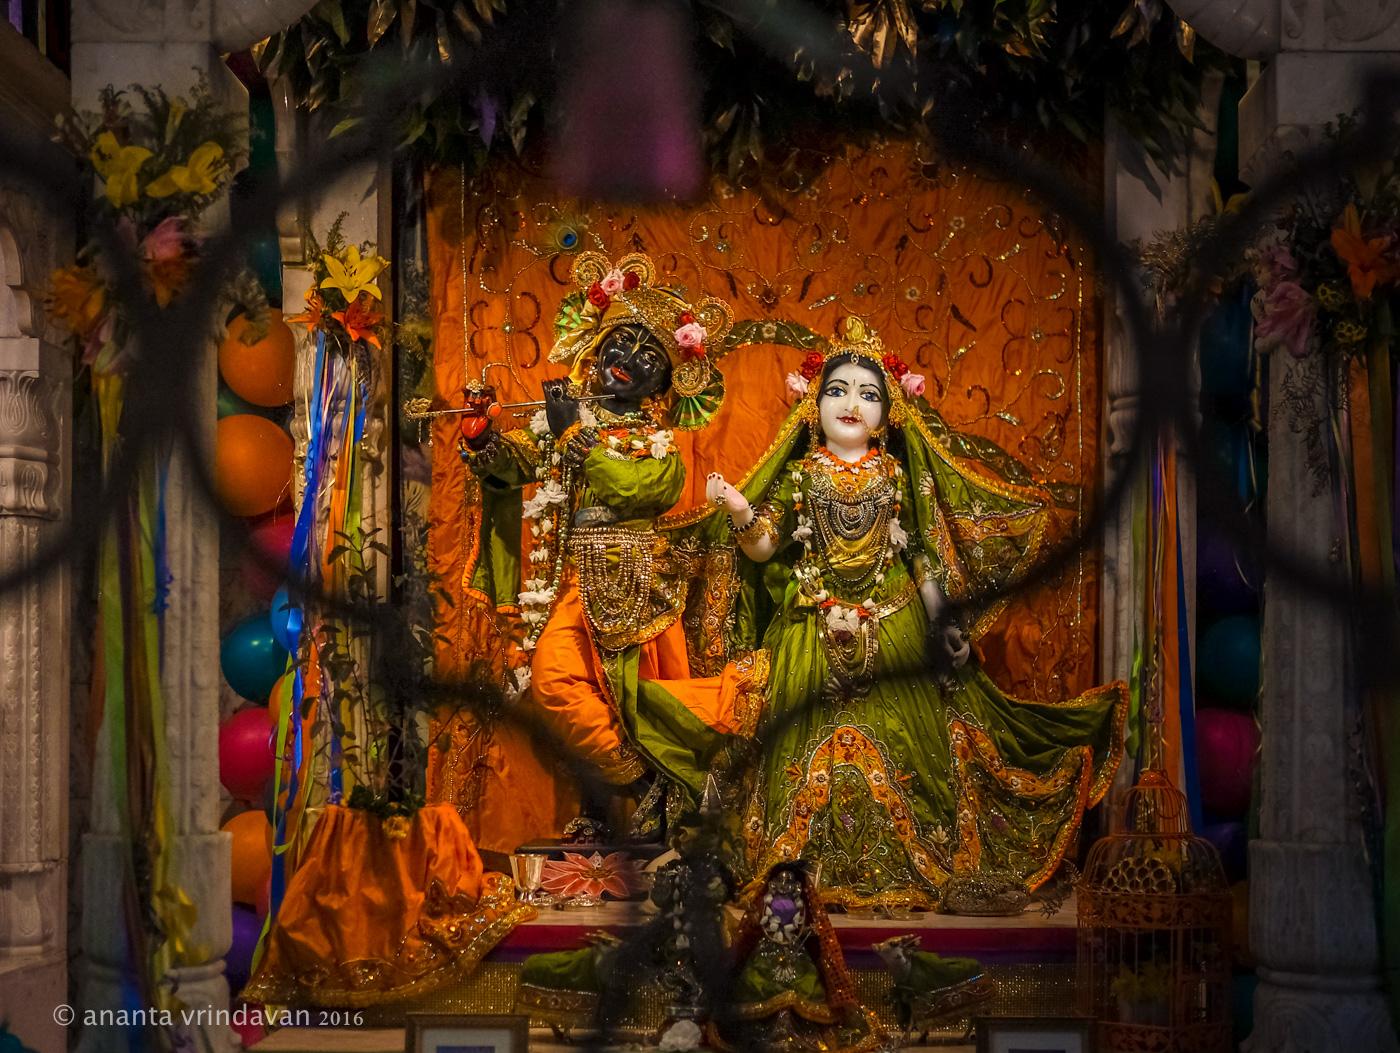 Our Deities Radha Govardhandhari at the temple; Photo: Anantha Vrindavan